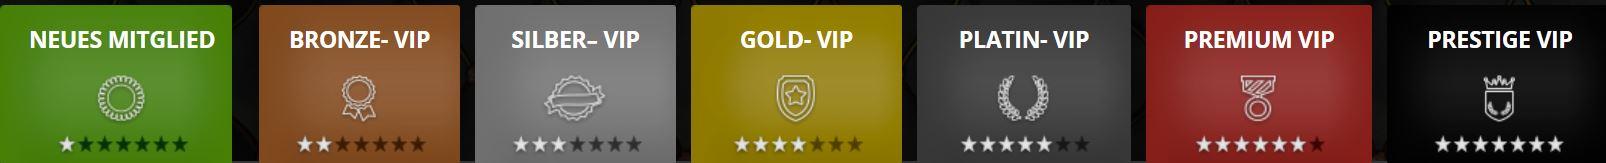 VIP Club CasinoLuck